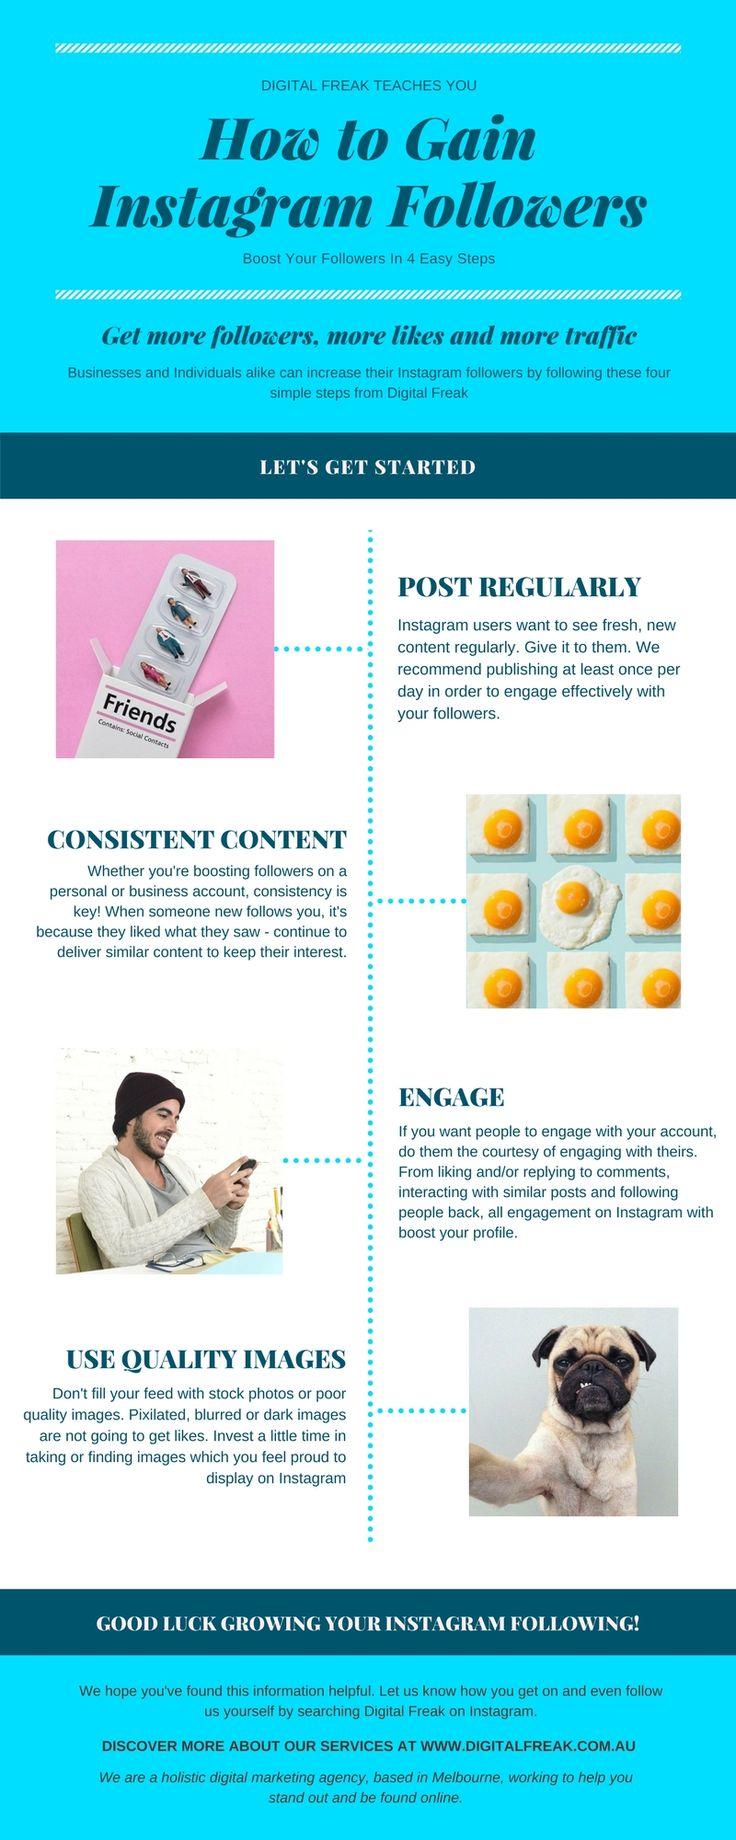 Get more #Instagram followers in 4 Easy Steps. Simple but effective #SocialMedia advice for free from #DigitalFreak